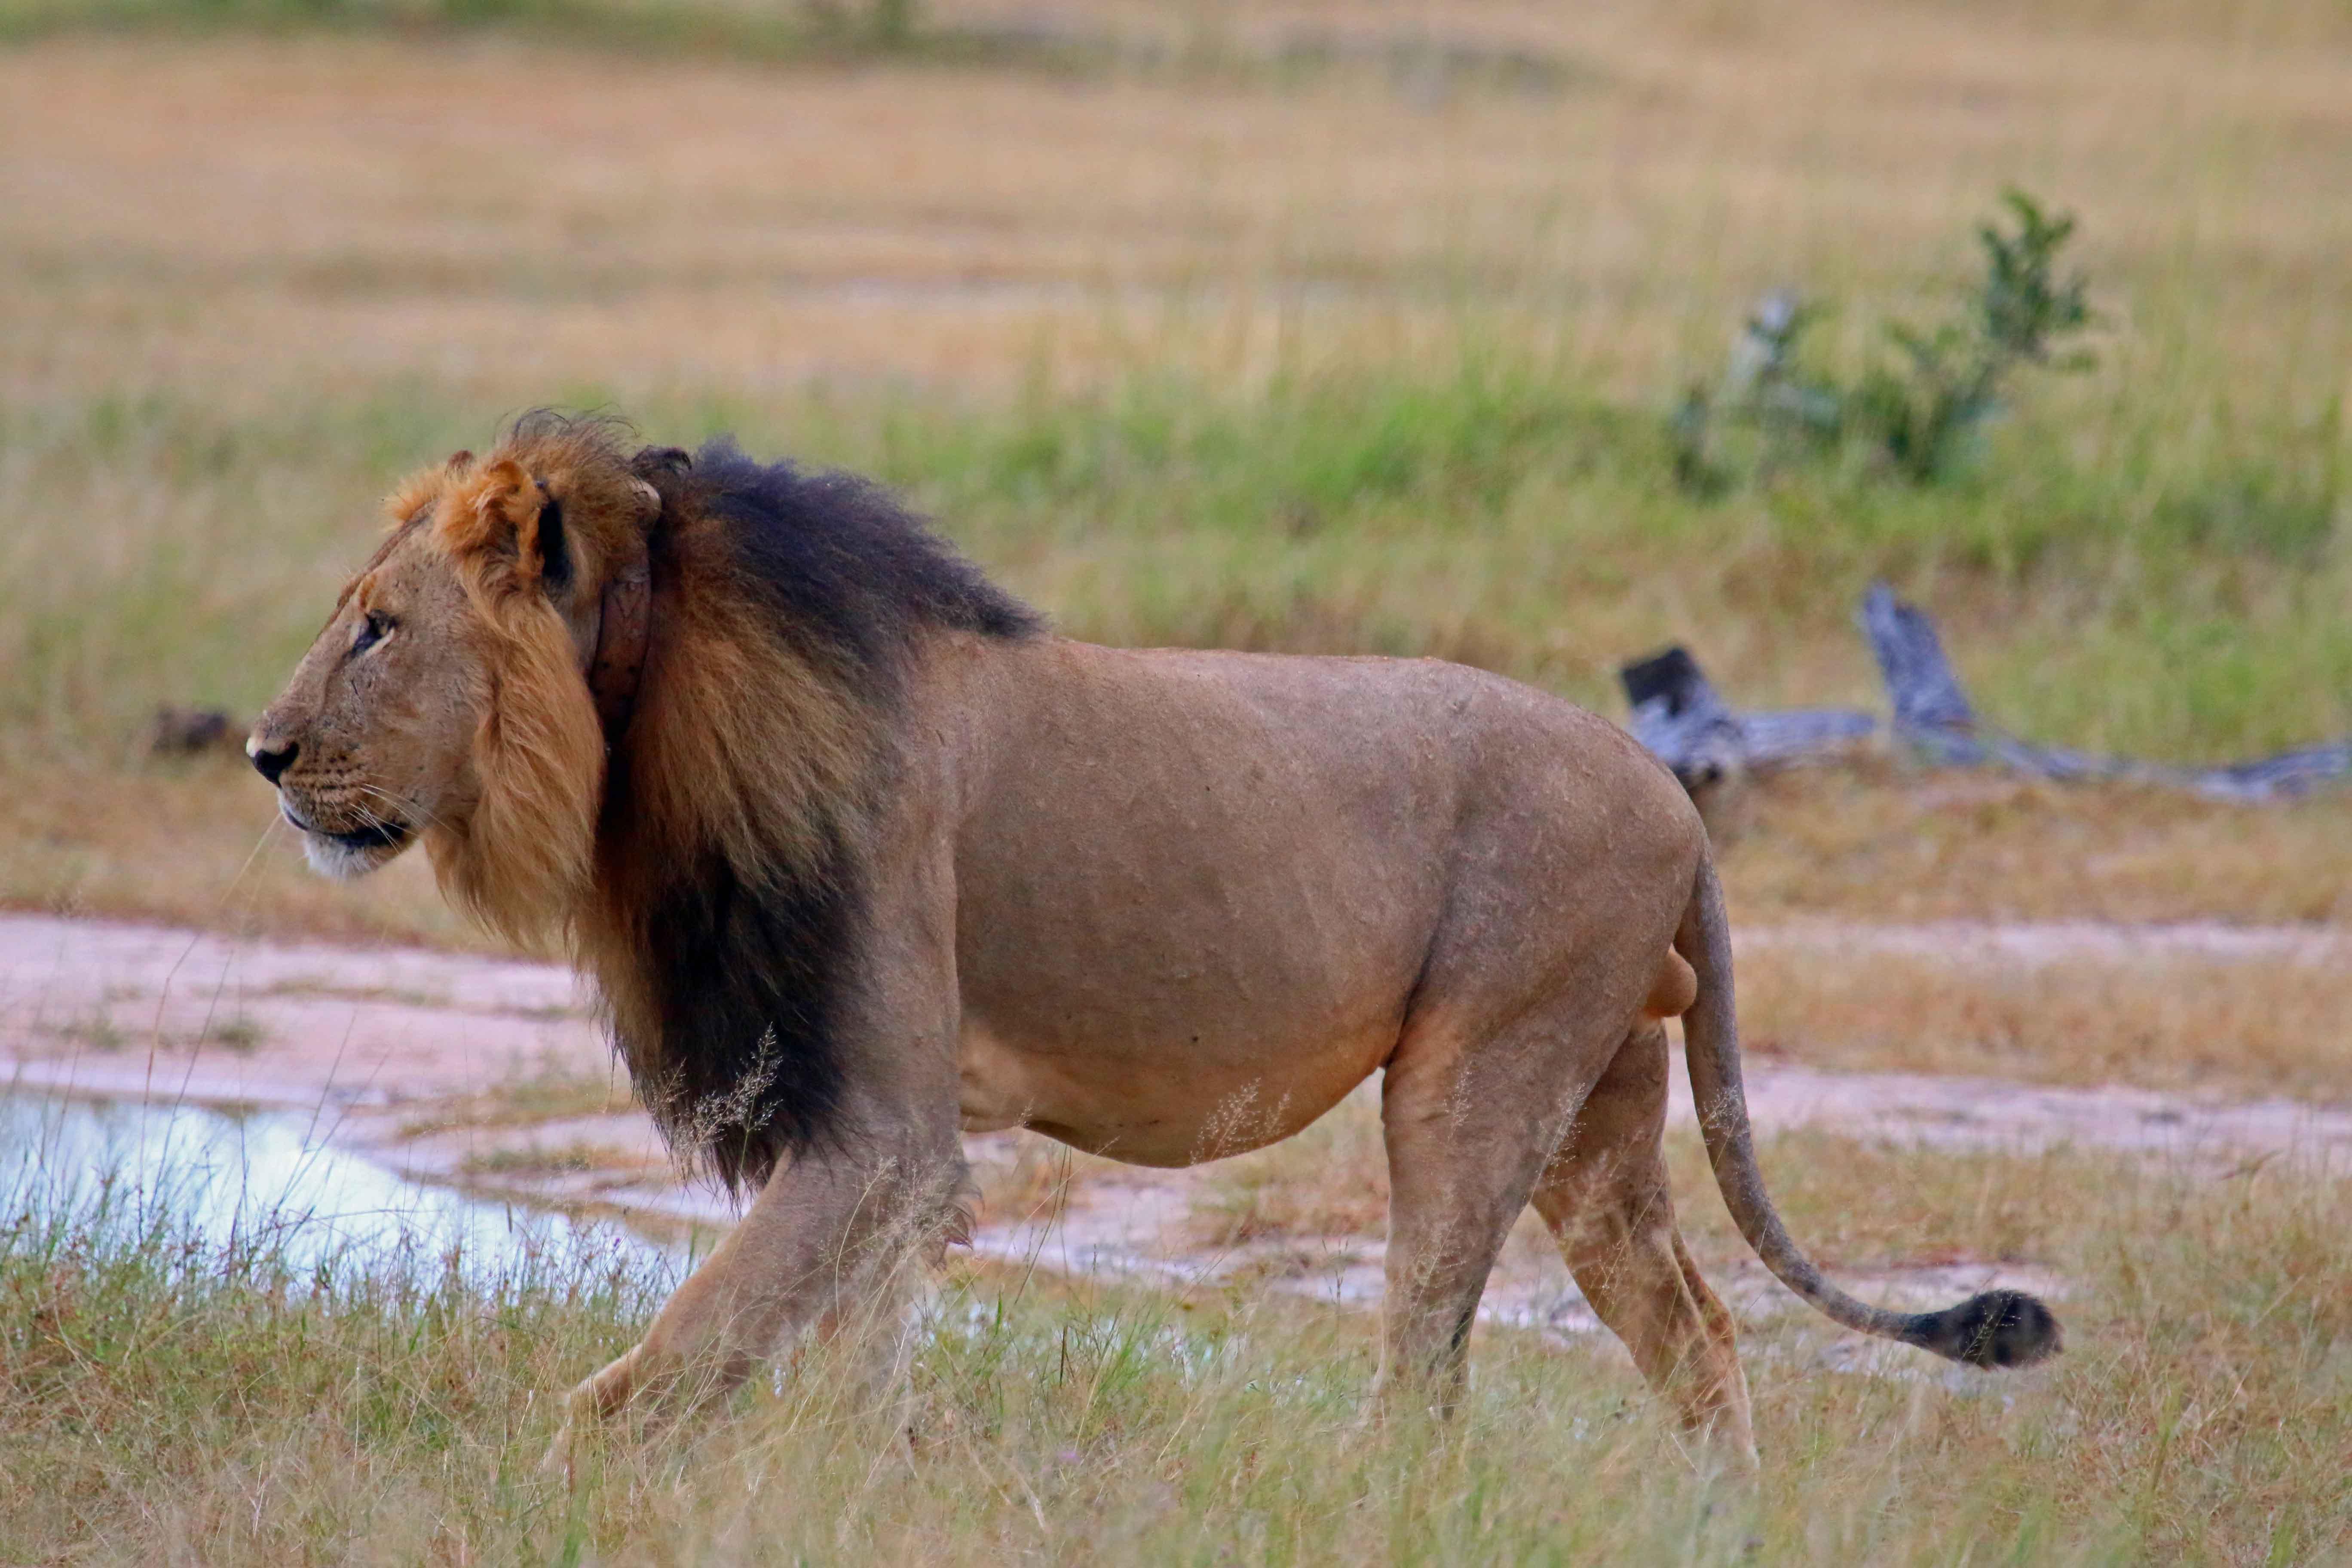 Cecil patrolling his territory, on safari in April 2014